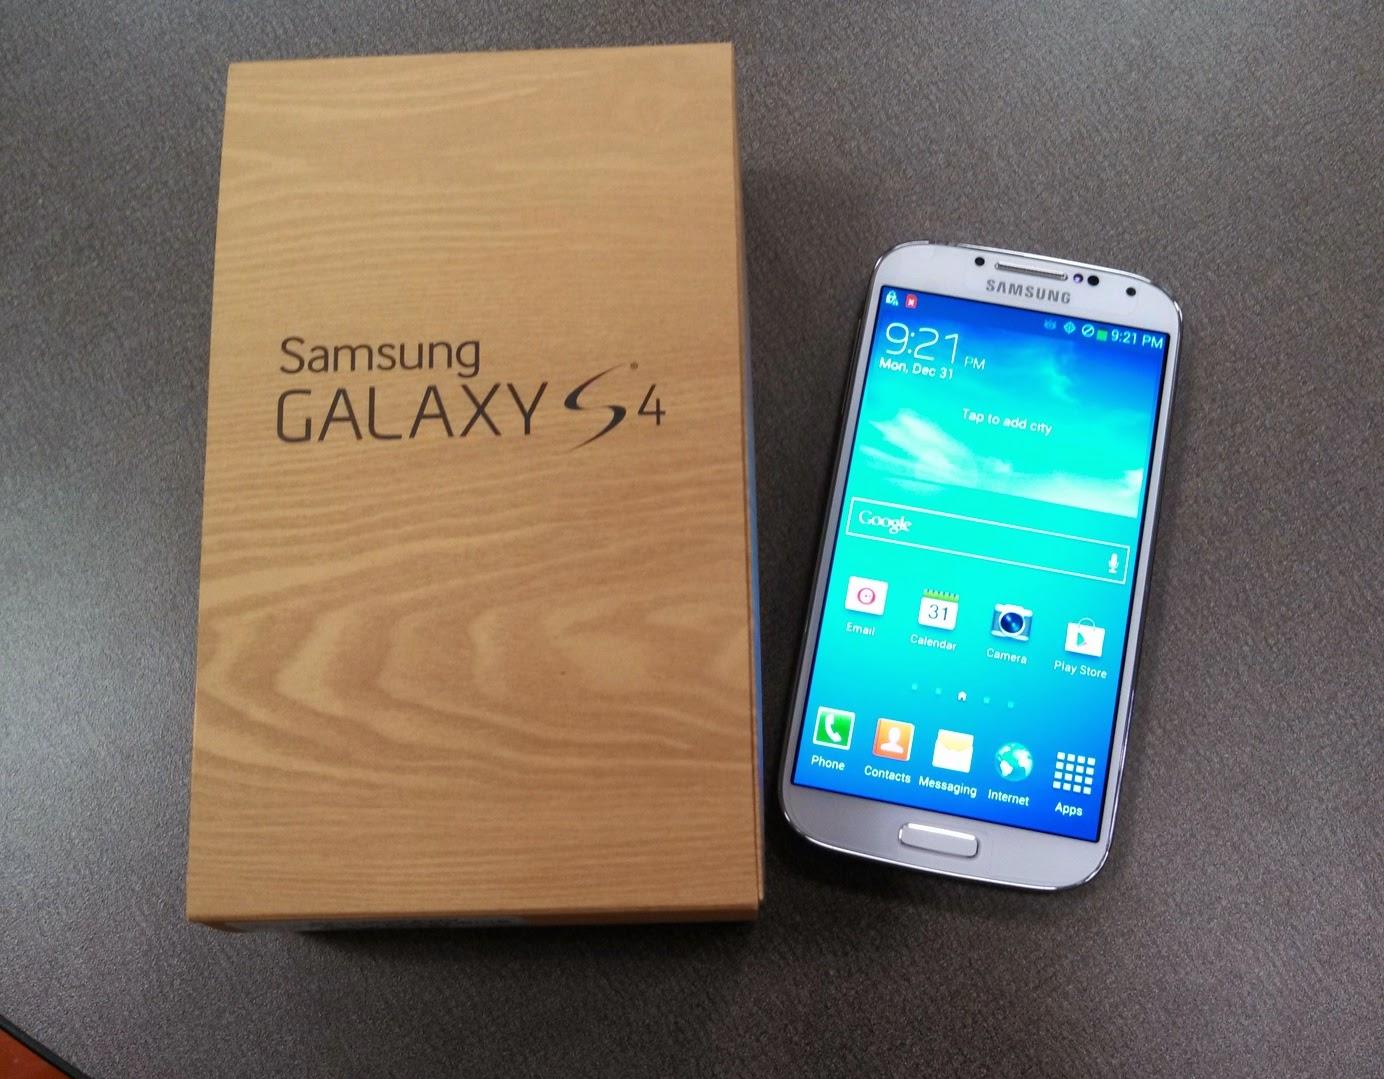 samsung galaxy note 4, galaxy note 4, spesifikasi galaxy note 4, note 4 akan dirilis, snapdragon 805, exynos prosesor